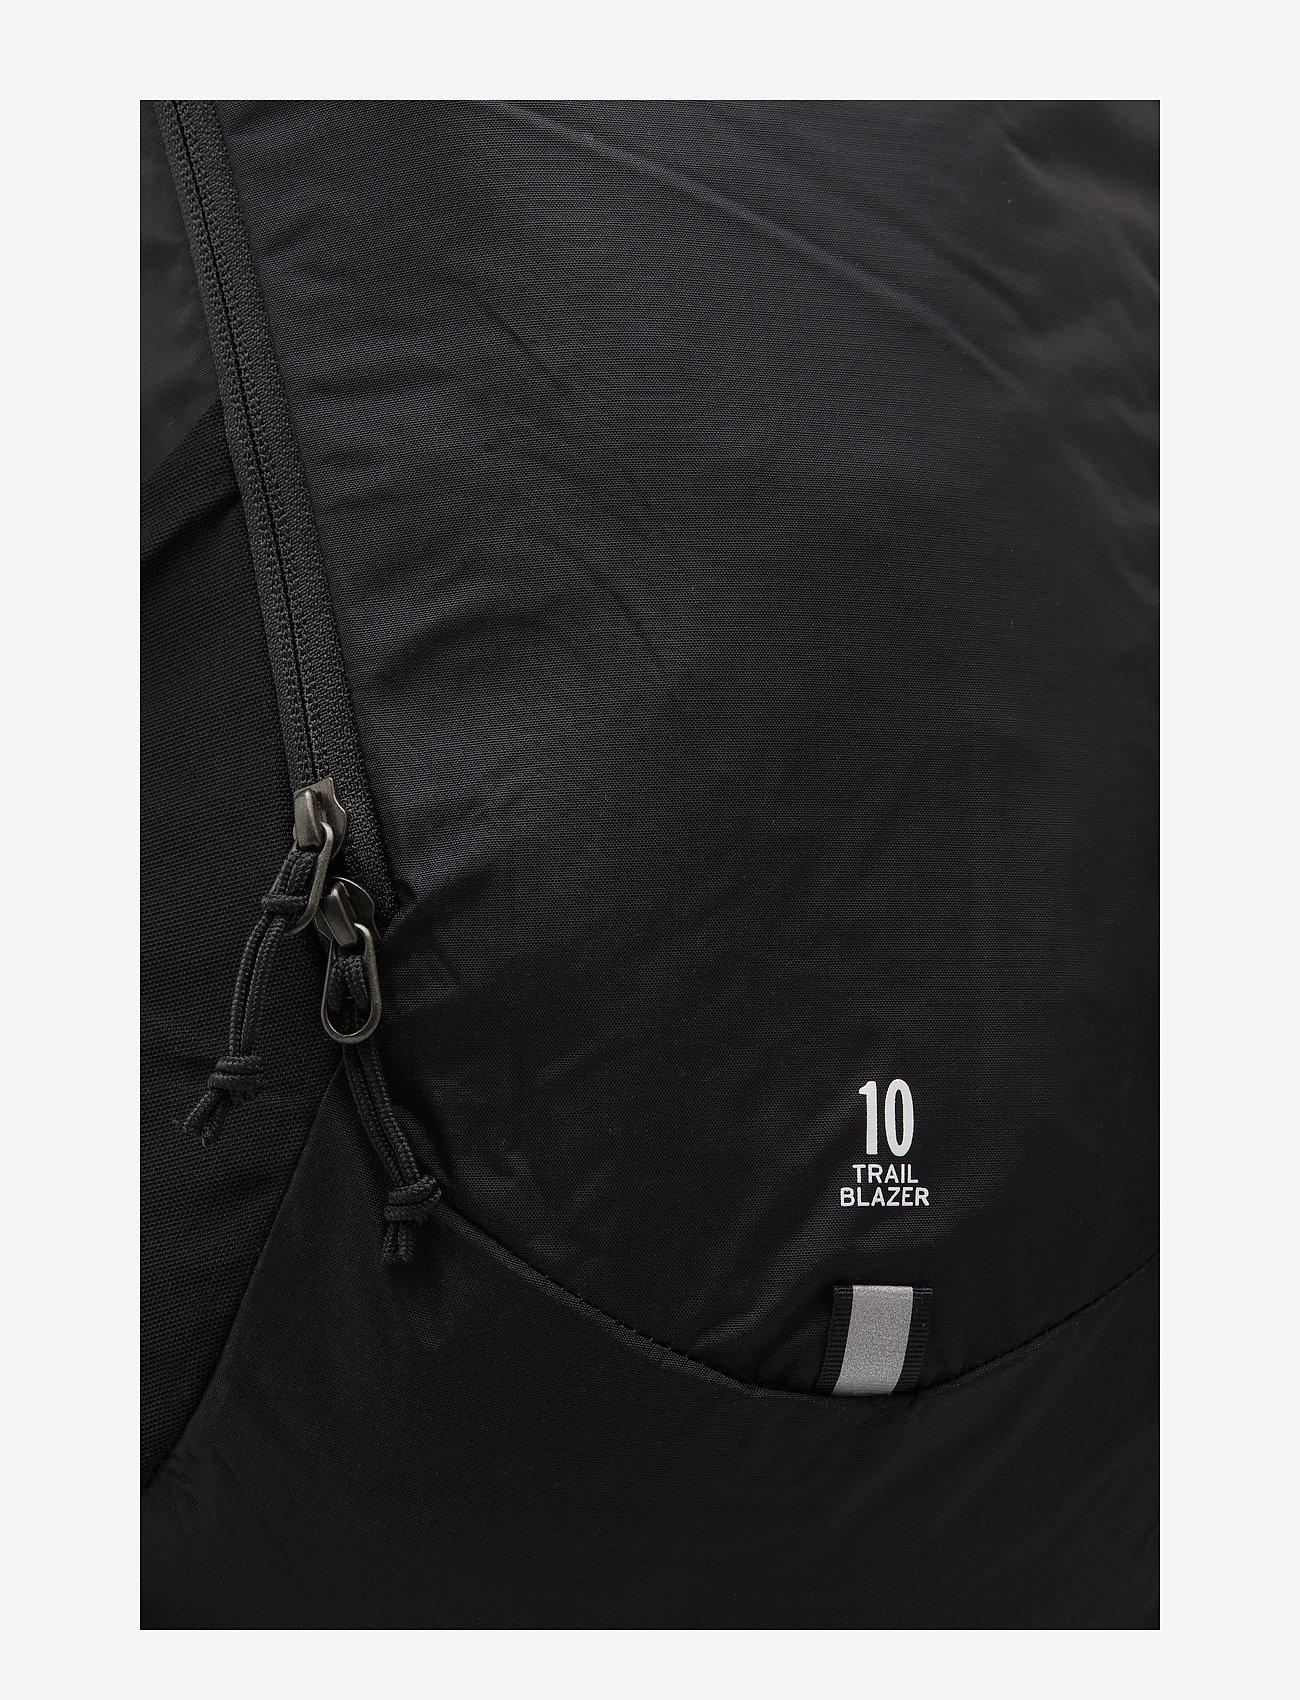 Trailblazer 10 (Black/black) (50 €) - Salomon 5uqQT